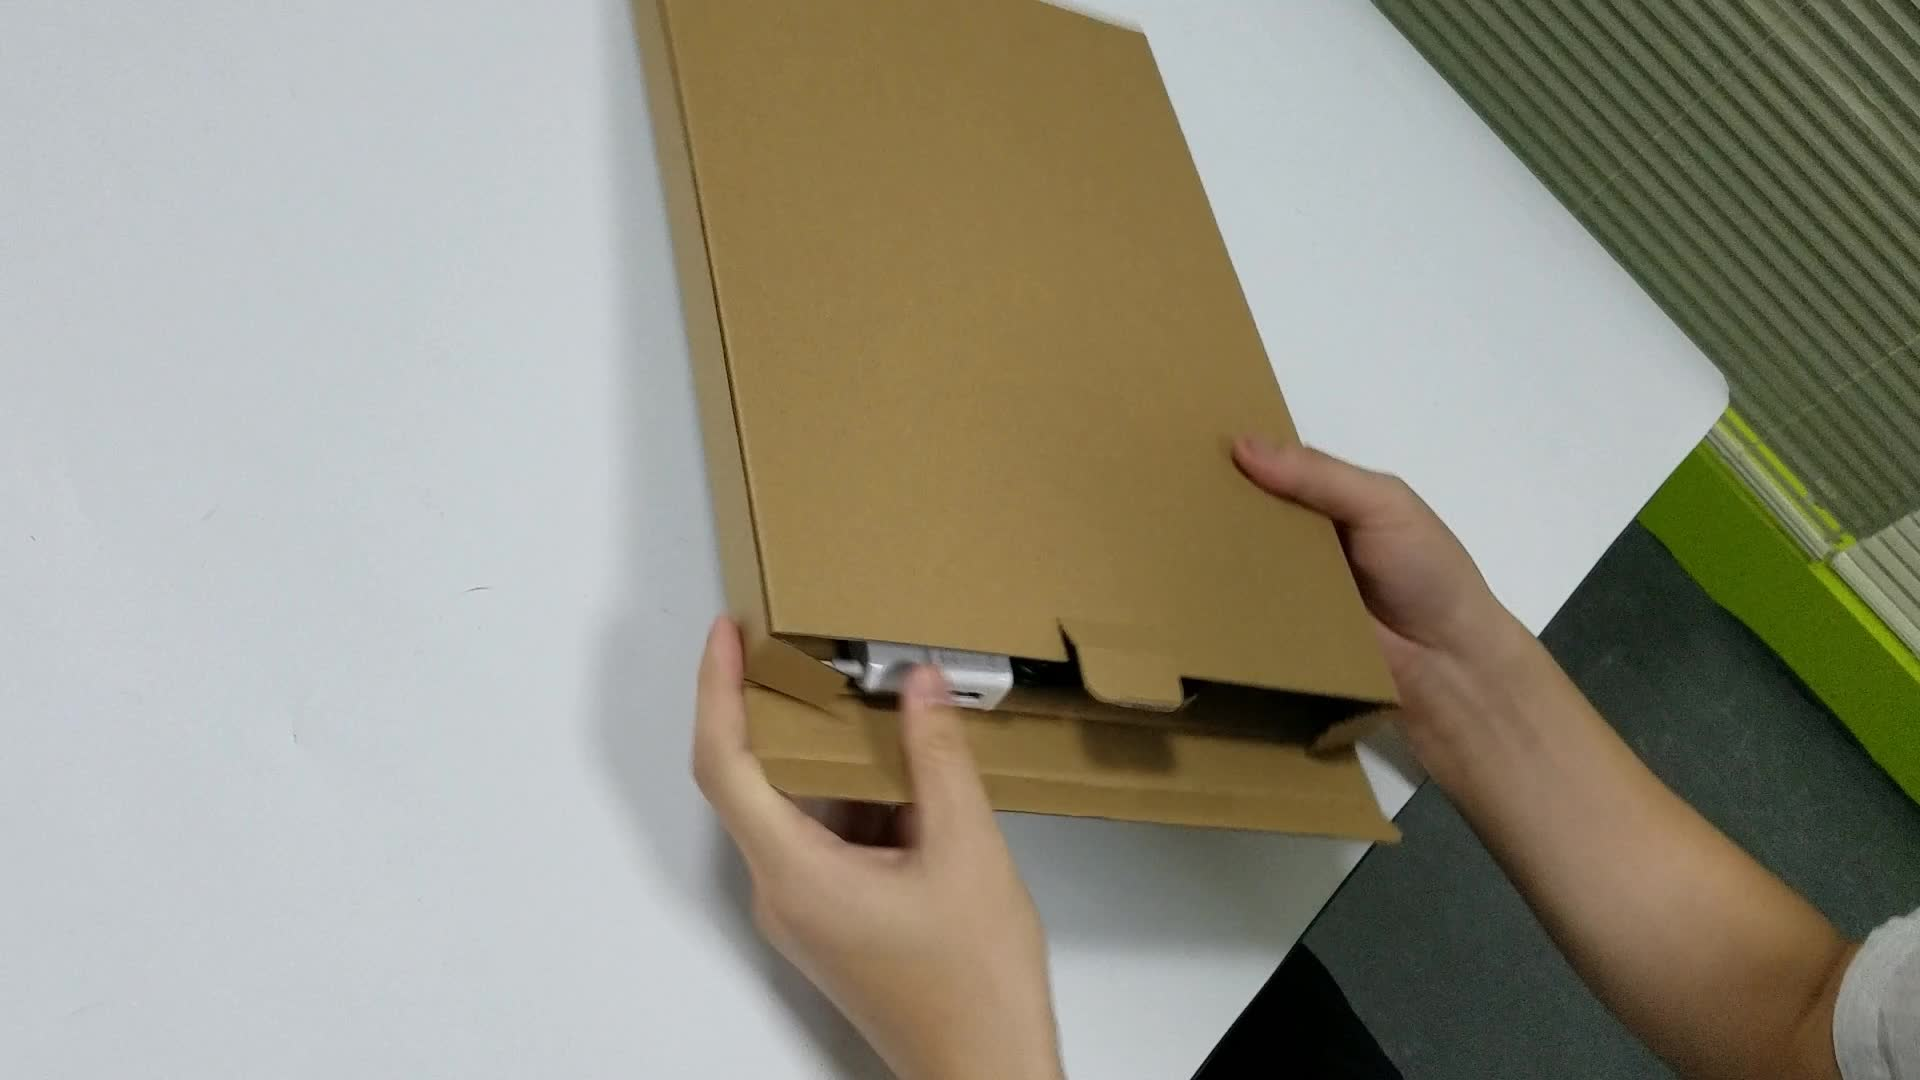 ultra thin A4 LED Adjustable Tracing Drawing Board Tattoo light box Illuminated tracing drawing board